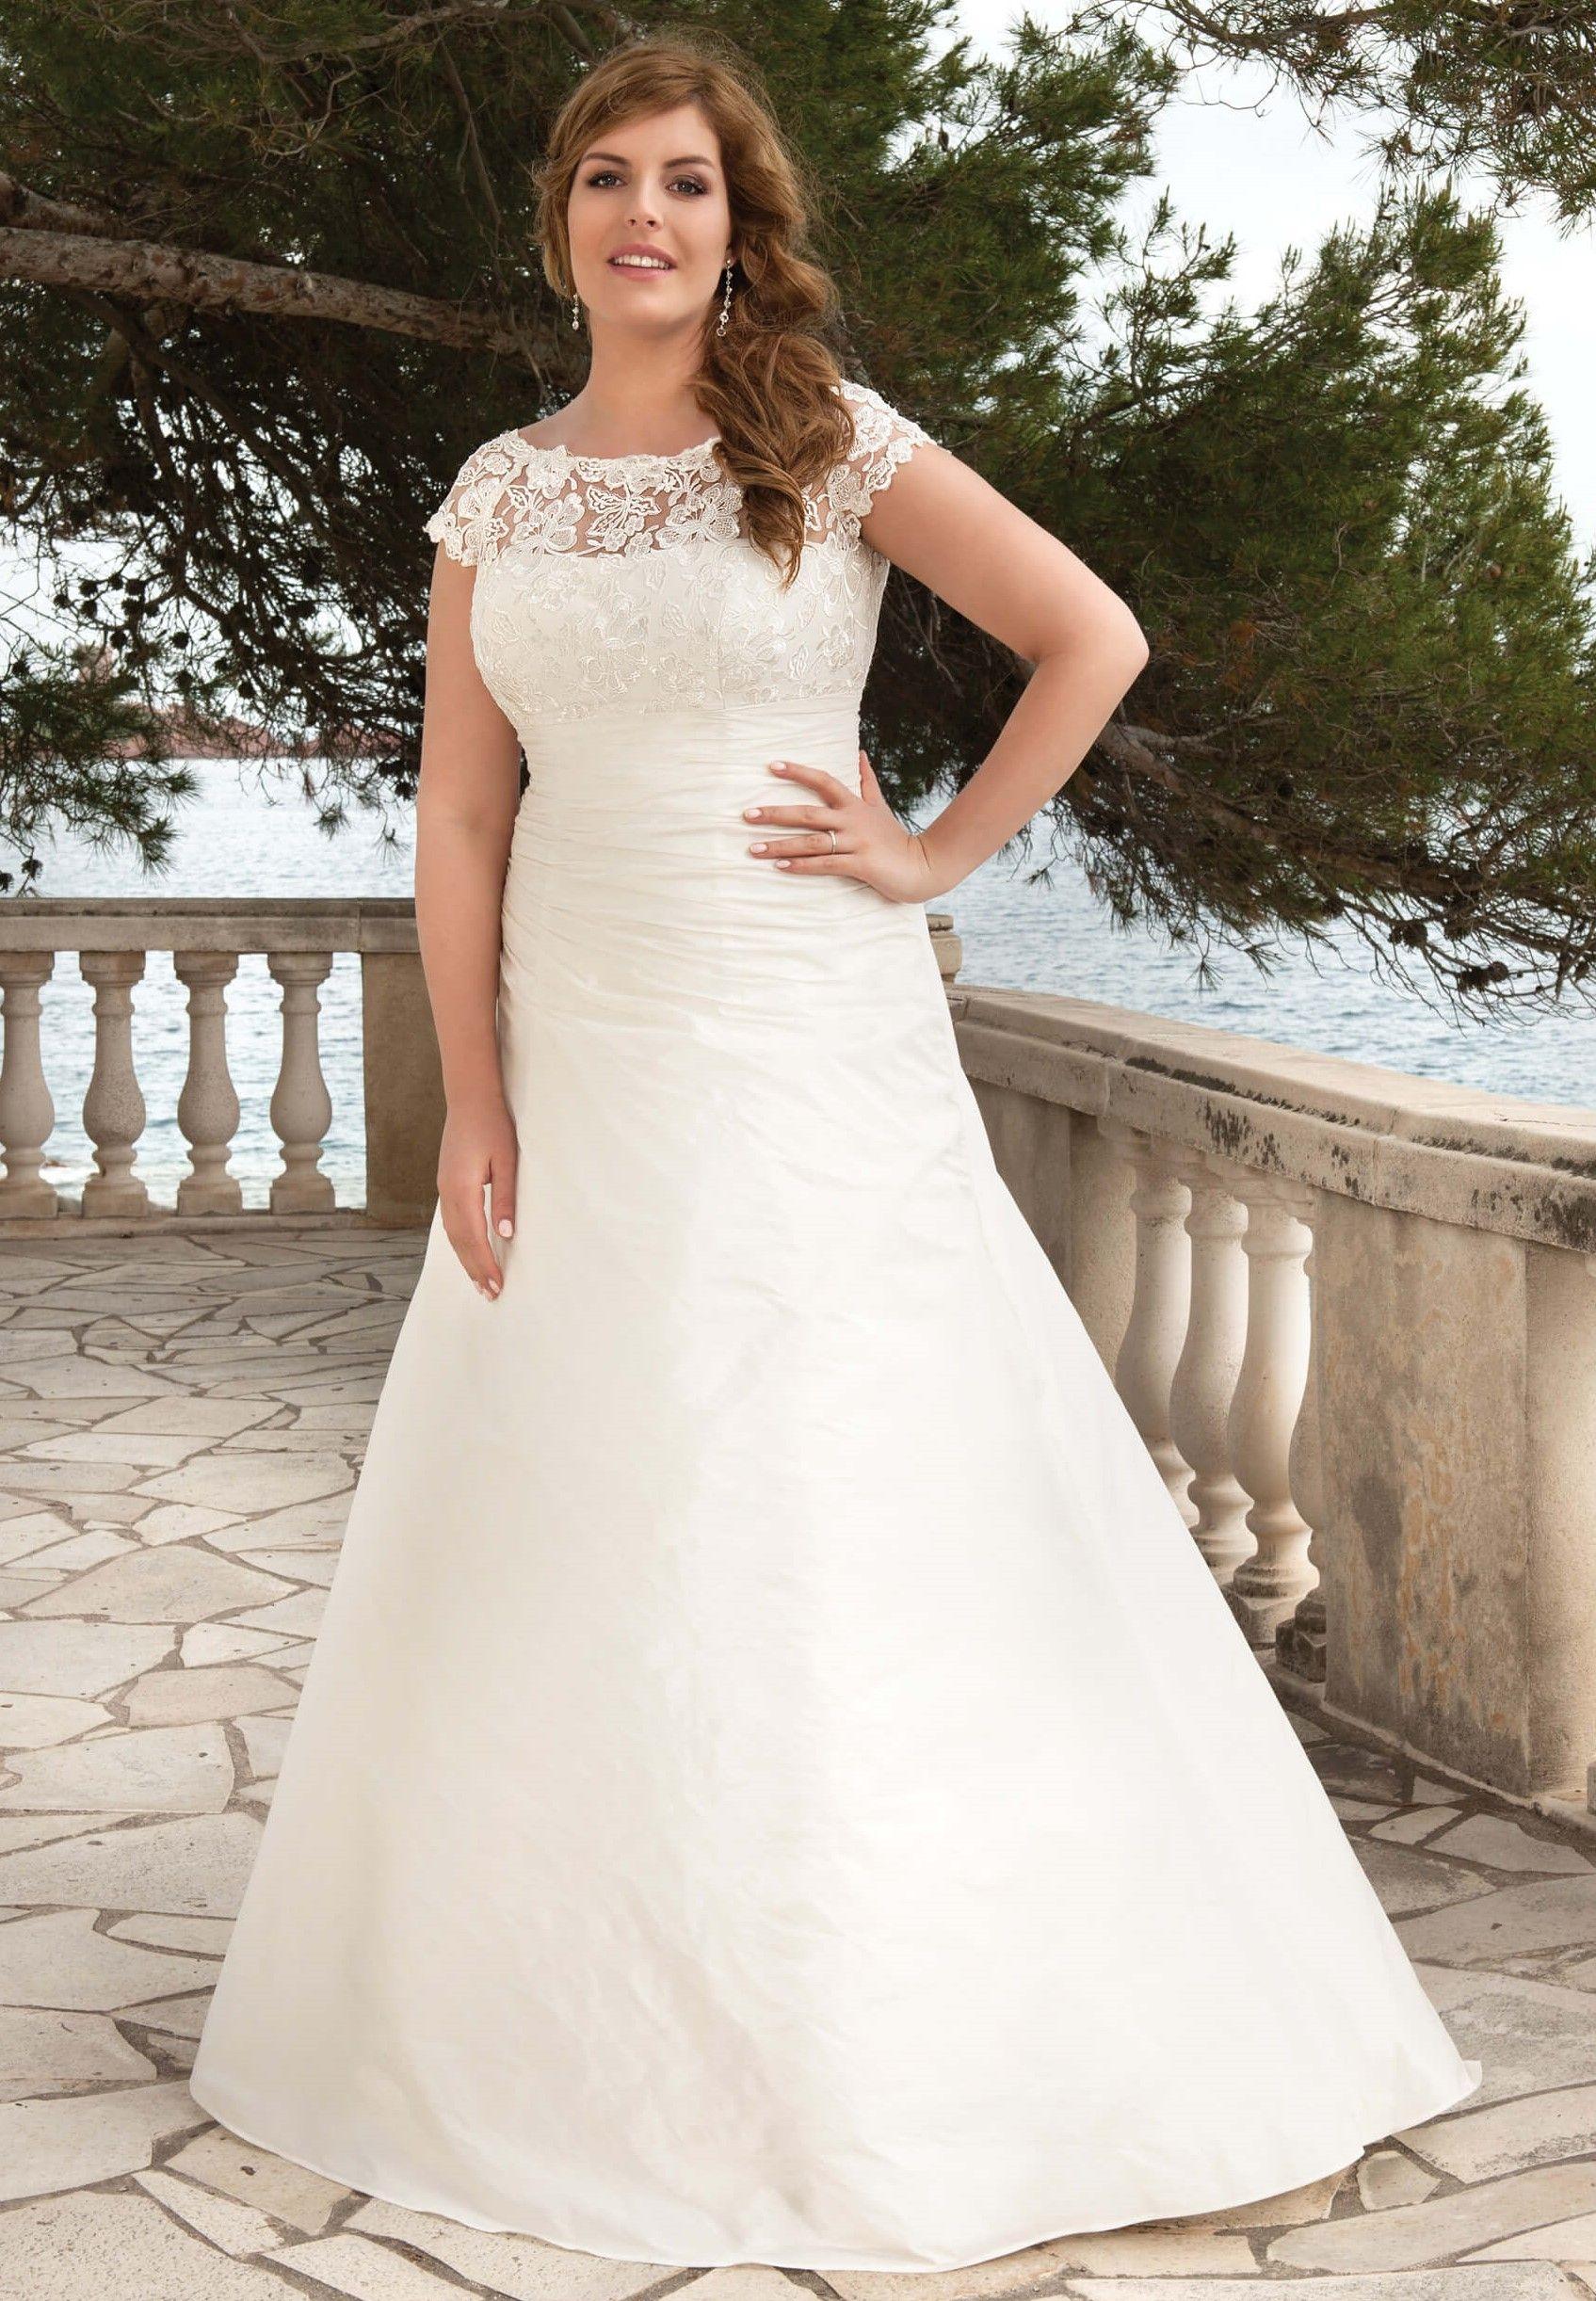 Wedding Dress Trouwjurk Bruidsjurk Plus Size Wedding Curves Bruiloft ...